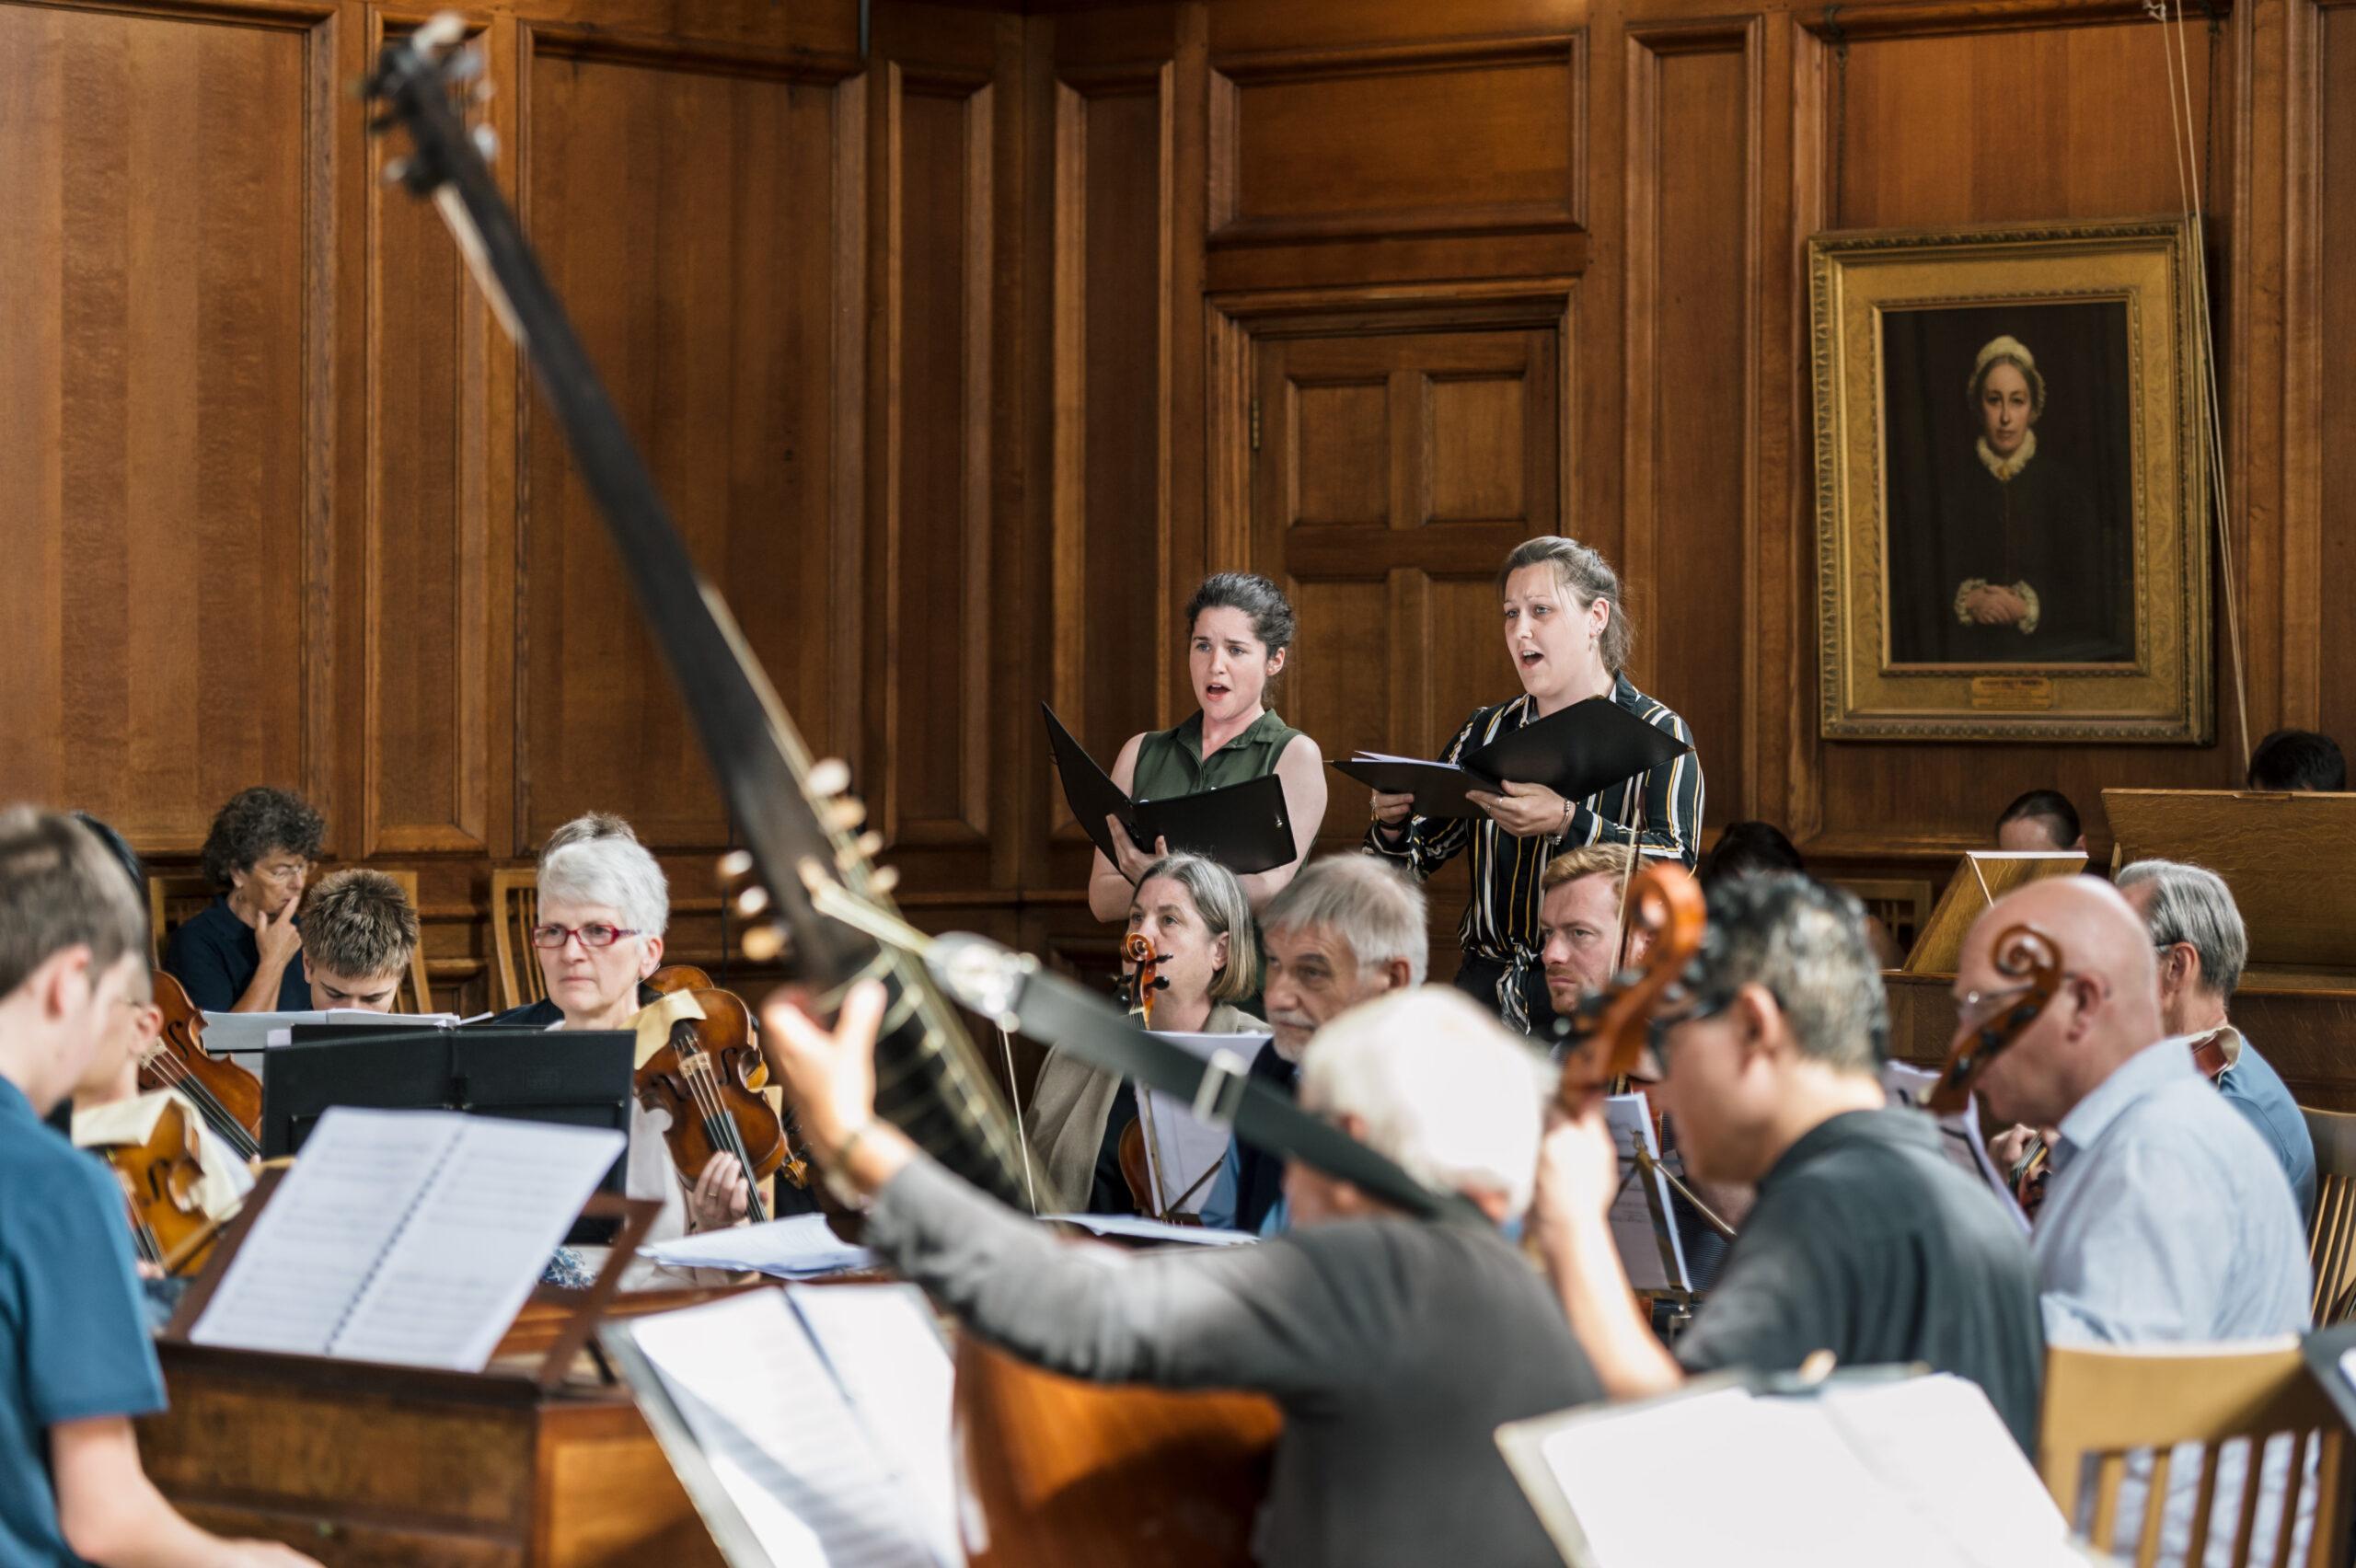 Baroque Summer School concert at Girton College 2019, Cambridge